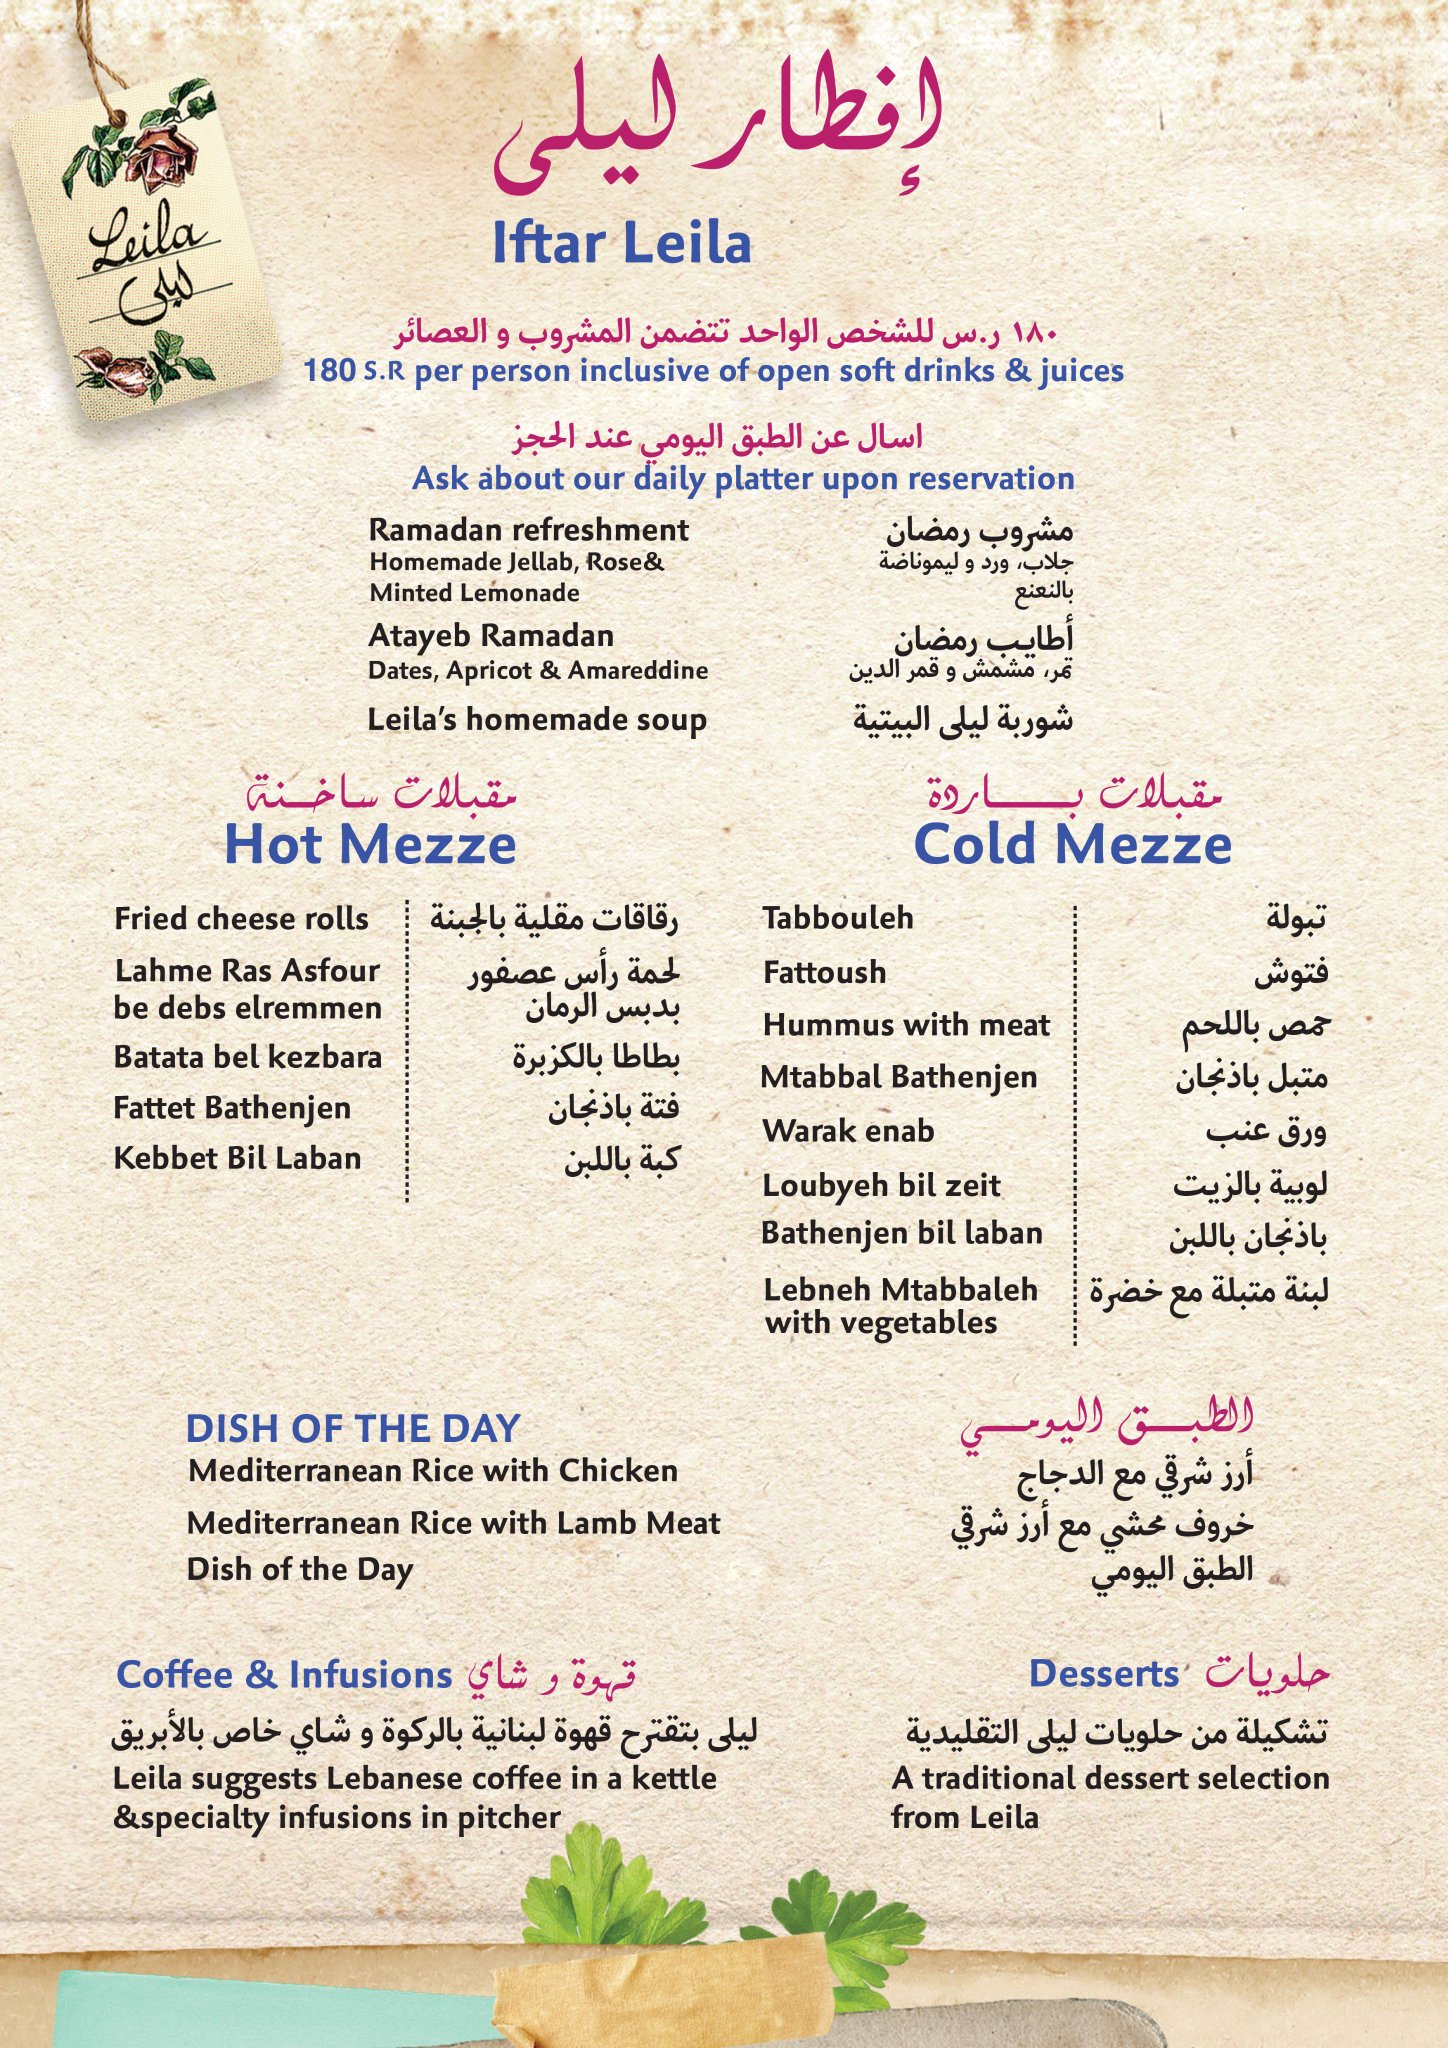 Leila Min Lebnen Ksa On Twitter عيش تجربة الافطار المميزة عند ليلى رمضان كريم افطار الرياض